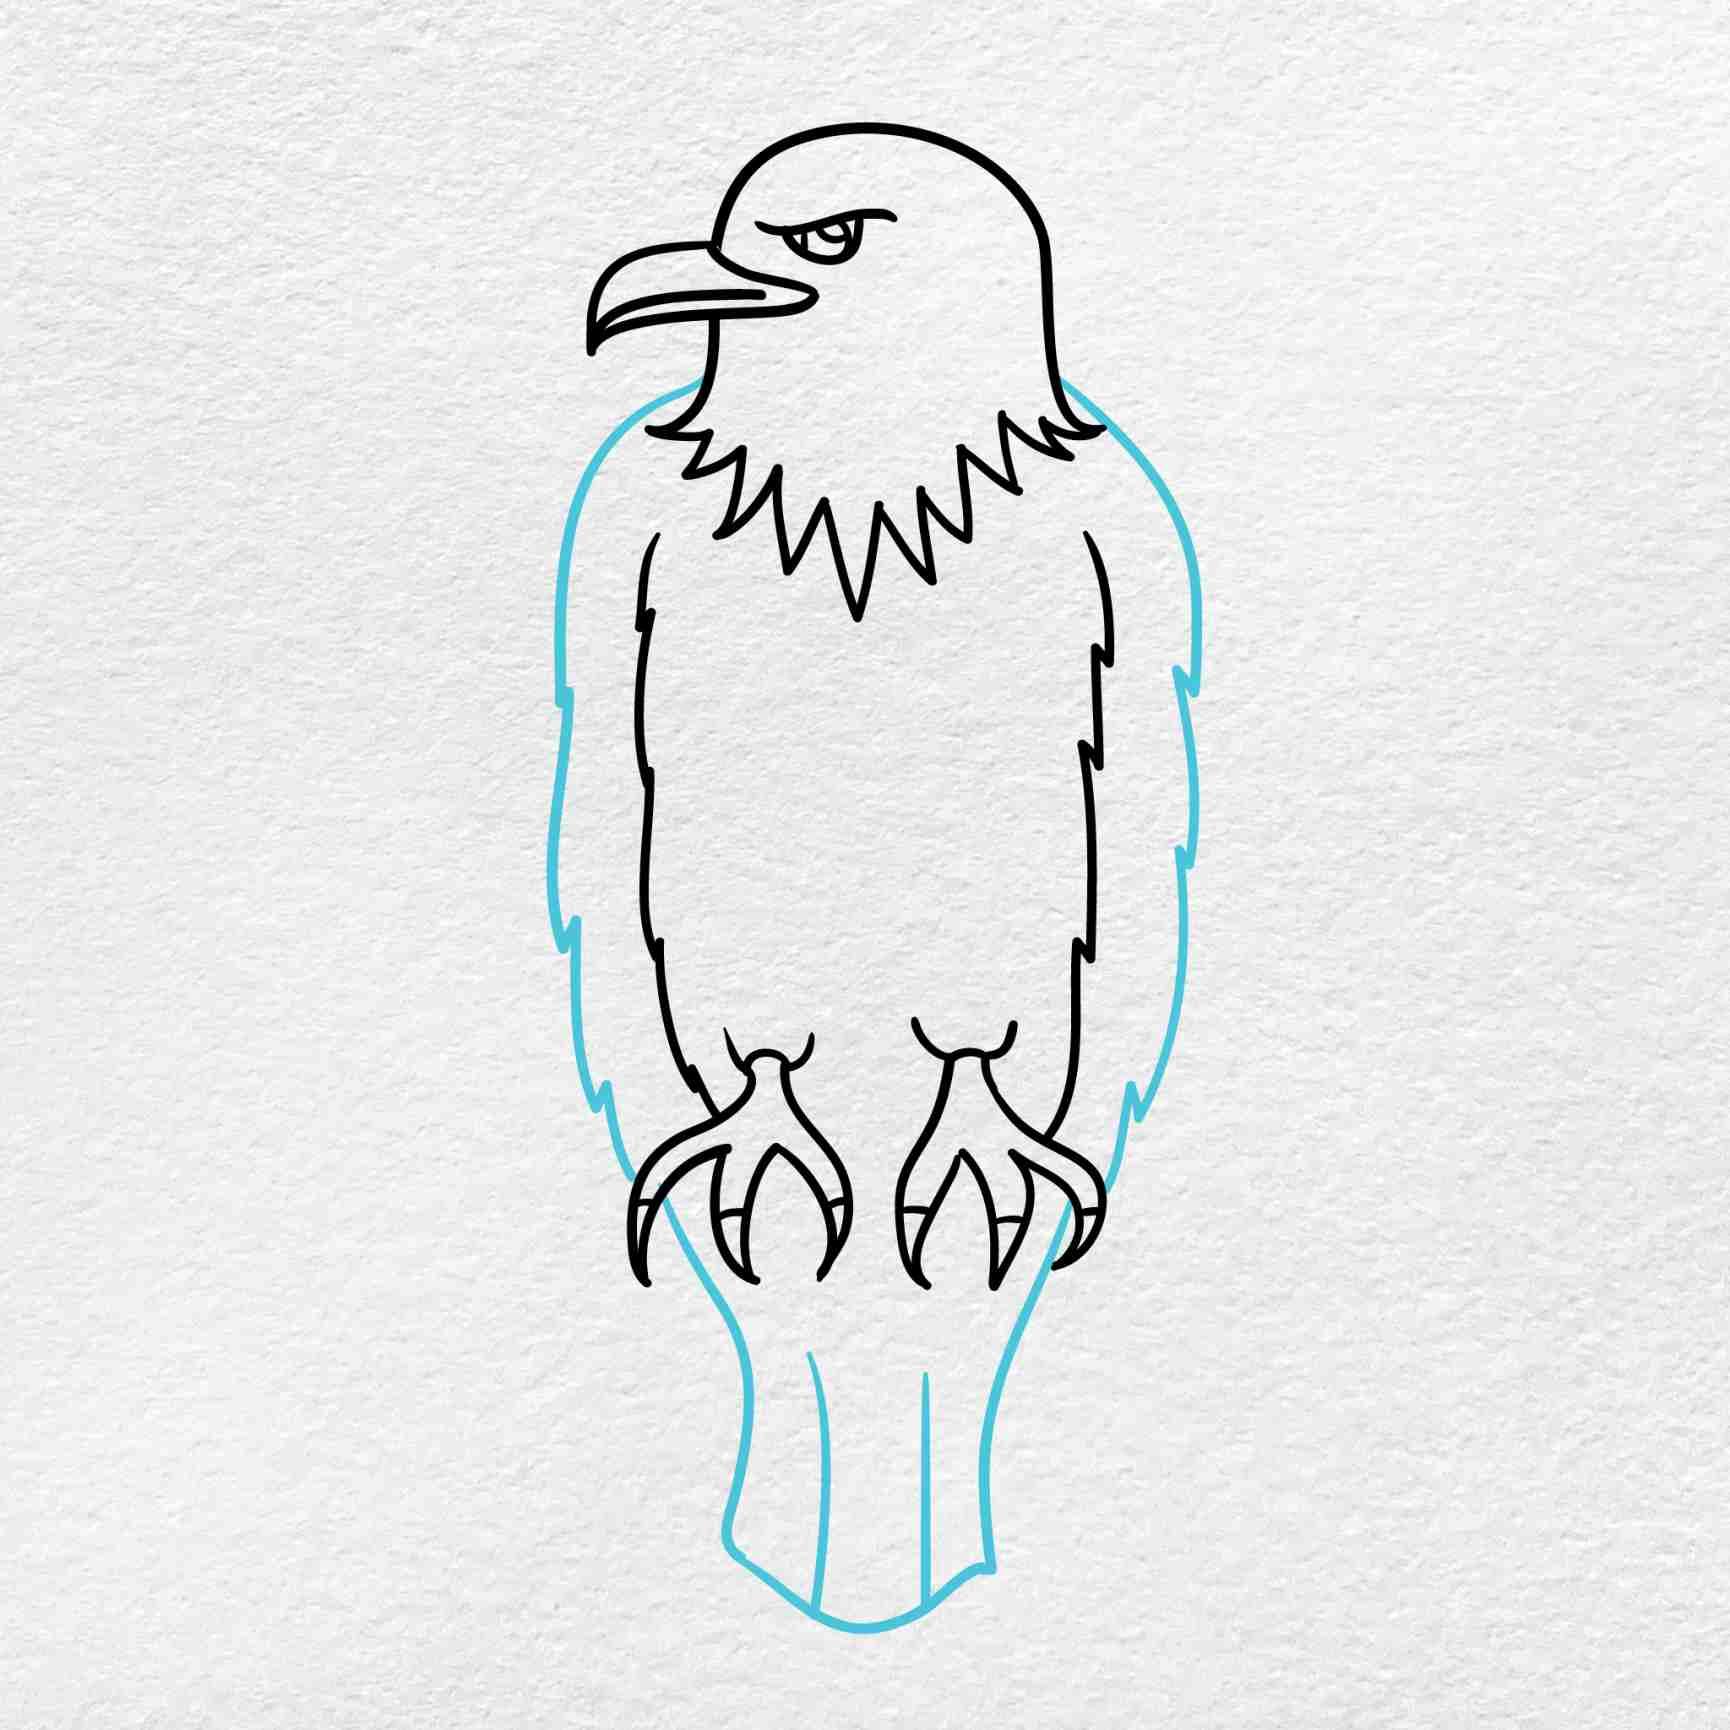 Bald Eagle Drawing: Step 5